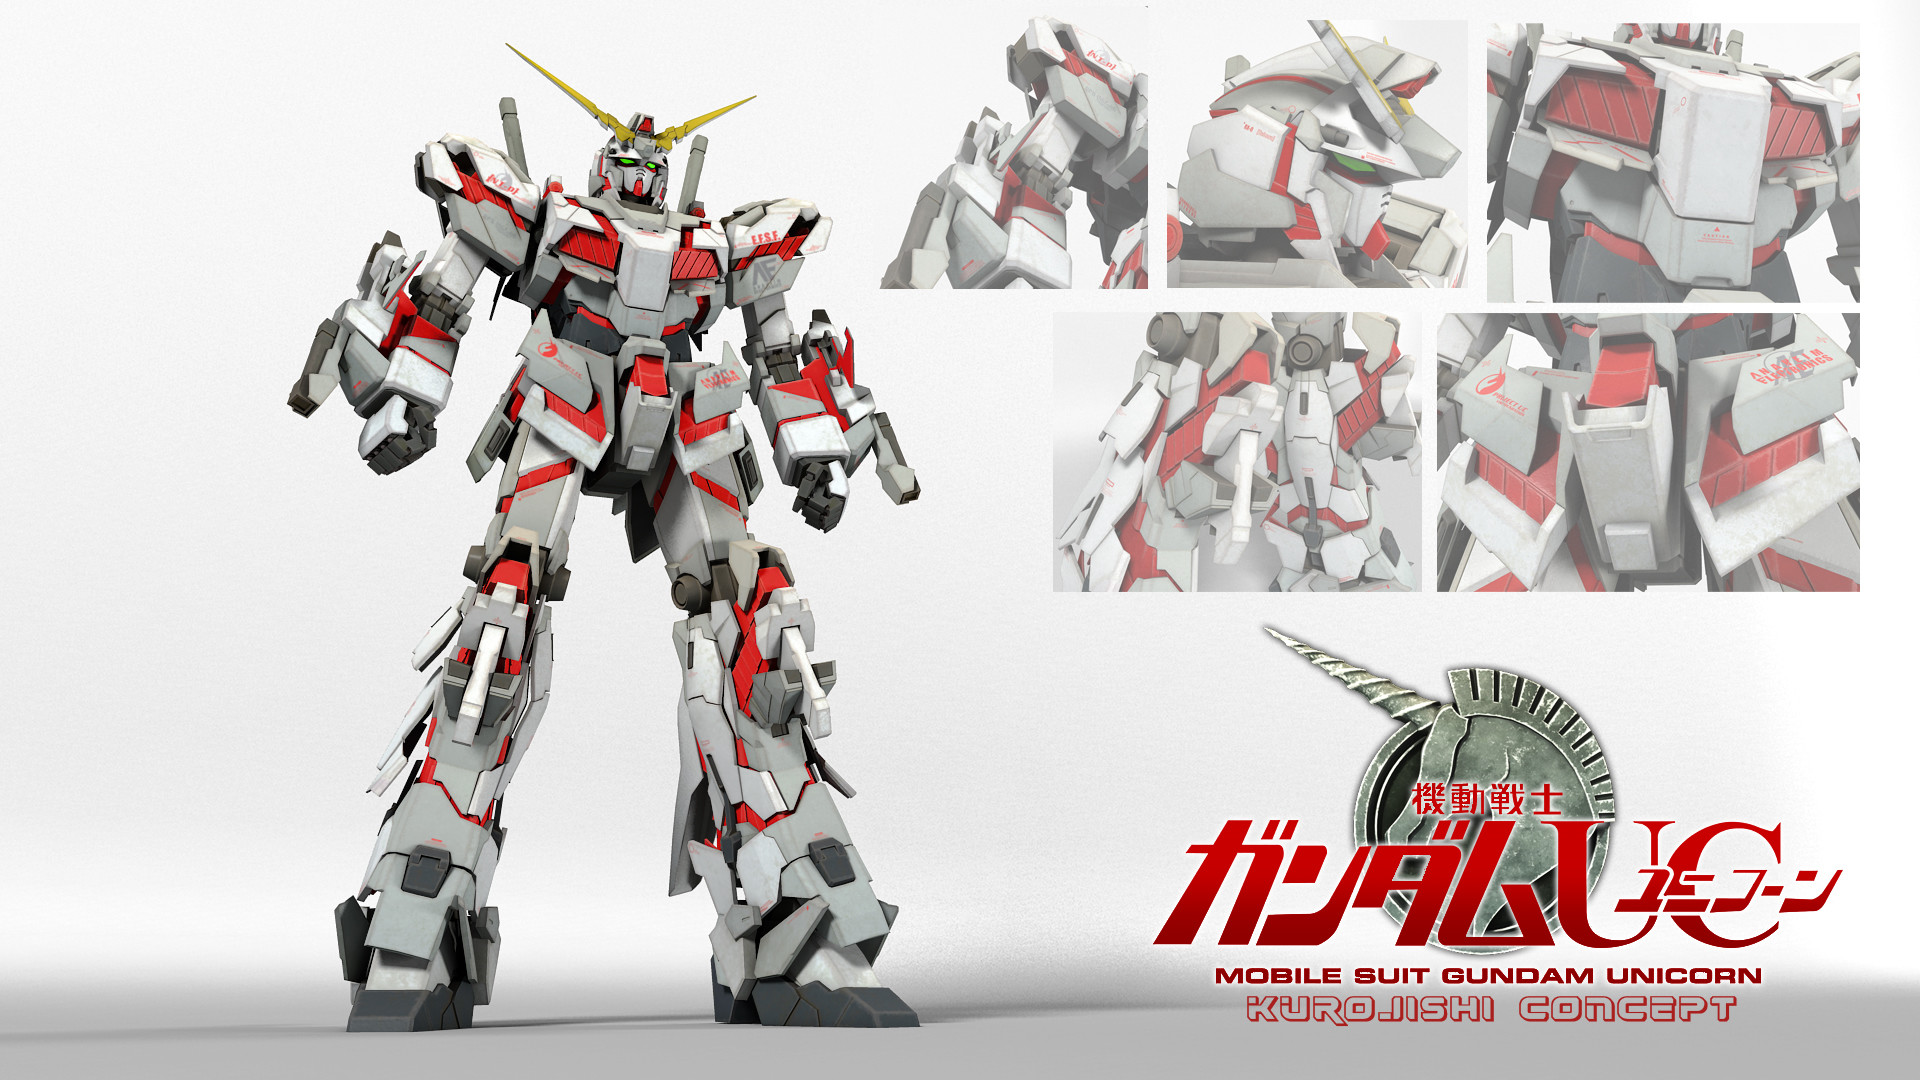 Gundam Unicorn Wallpaper 1920x1080